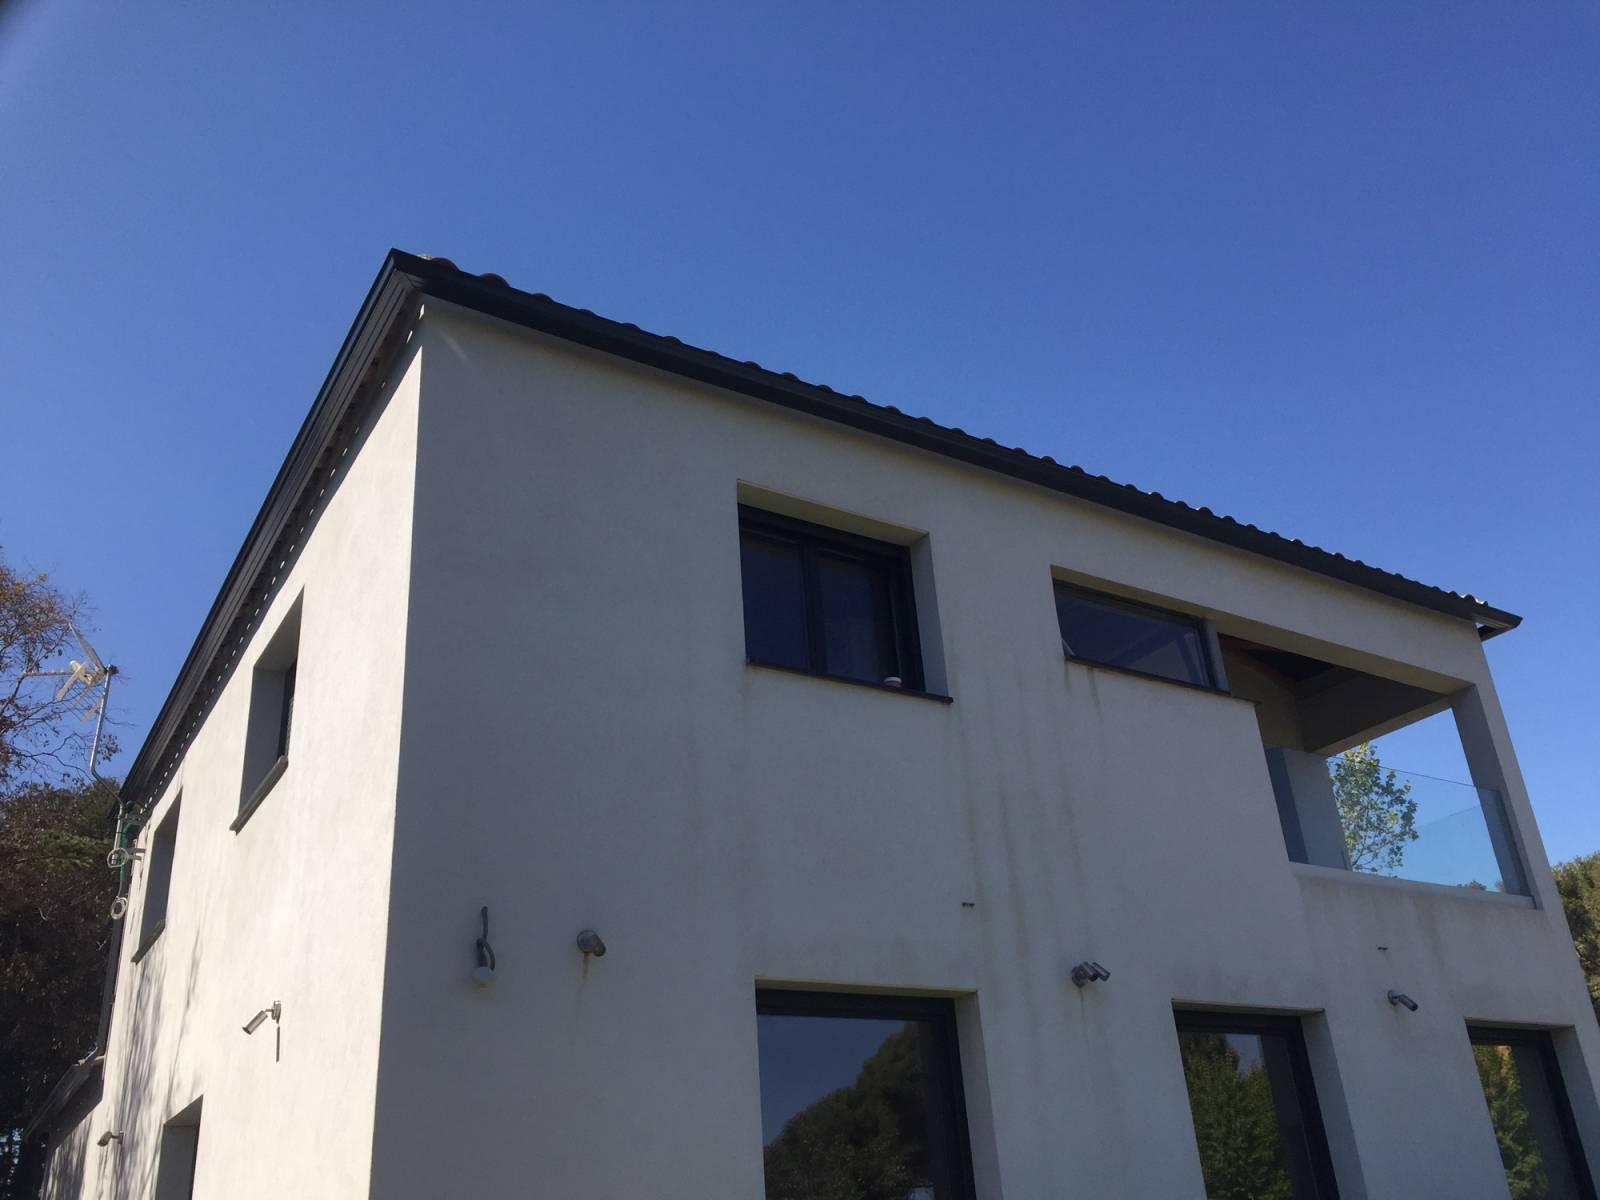 Goutti res aluminium laqu teinte ardoise 7016 pour cette for Teinte facade maison